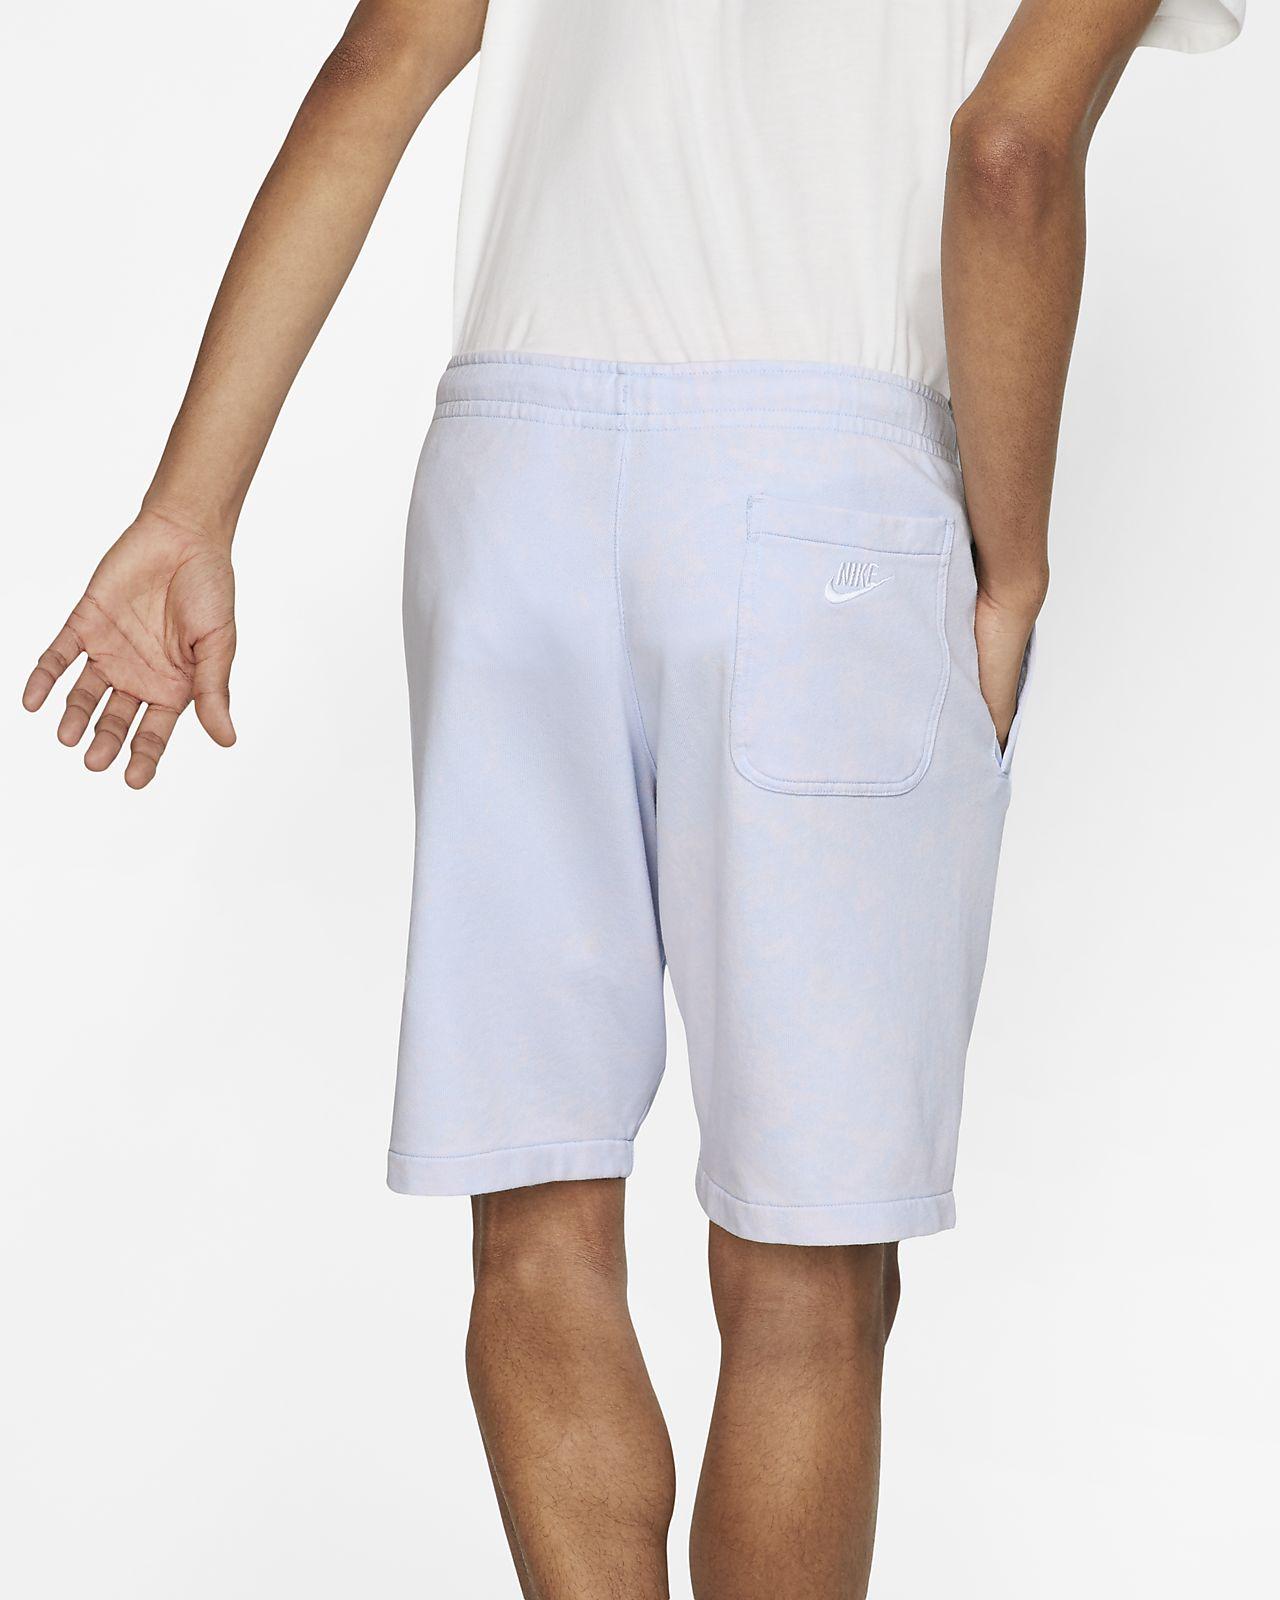 Nike Sportswear French Terry Shorts